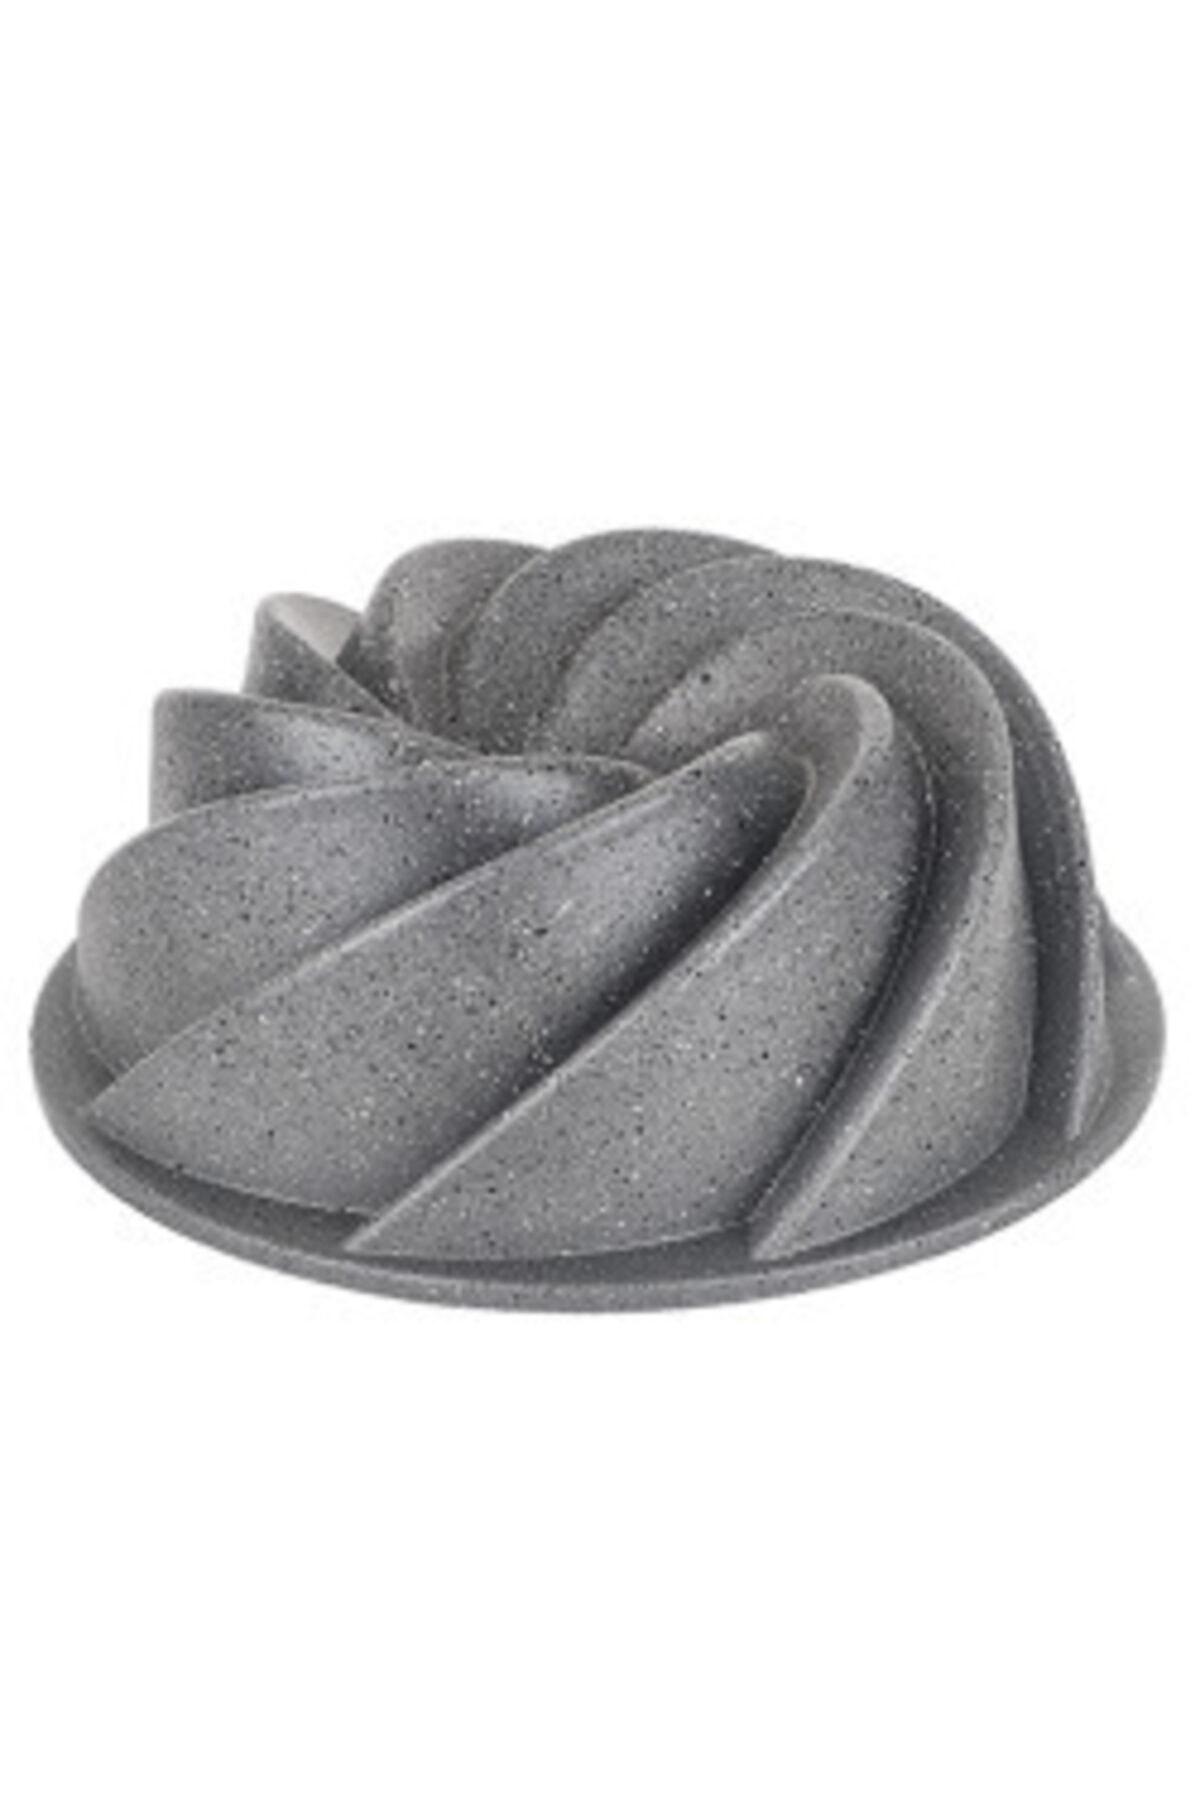 Tantitoni Gri Rüzgar Gülü Granit Döküm Kek Kalıbı 2